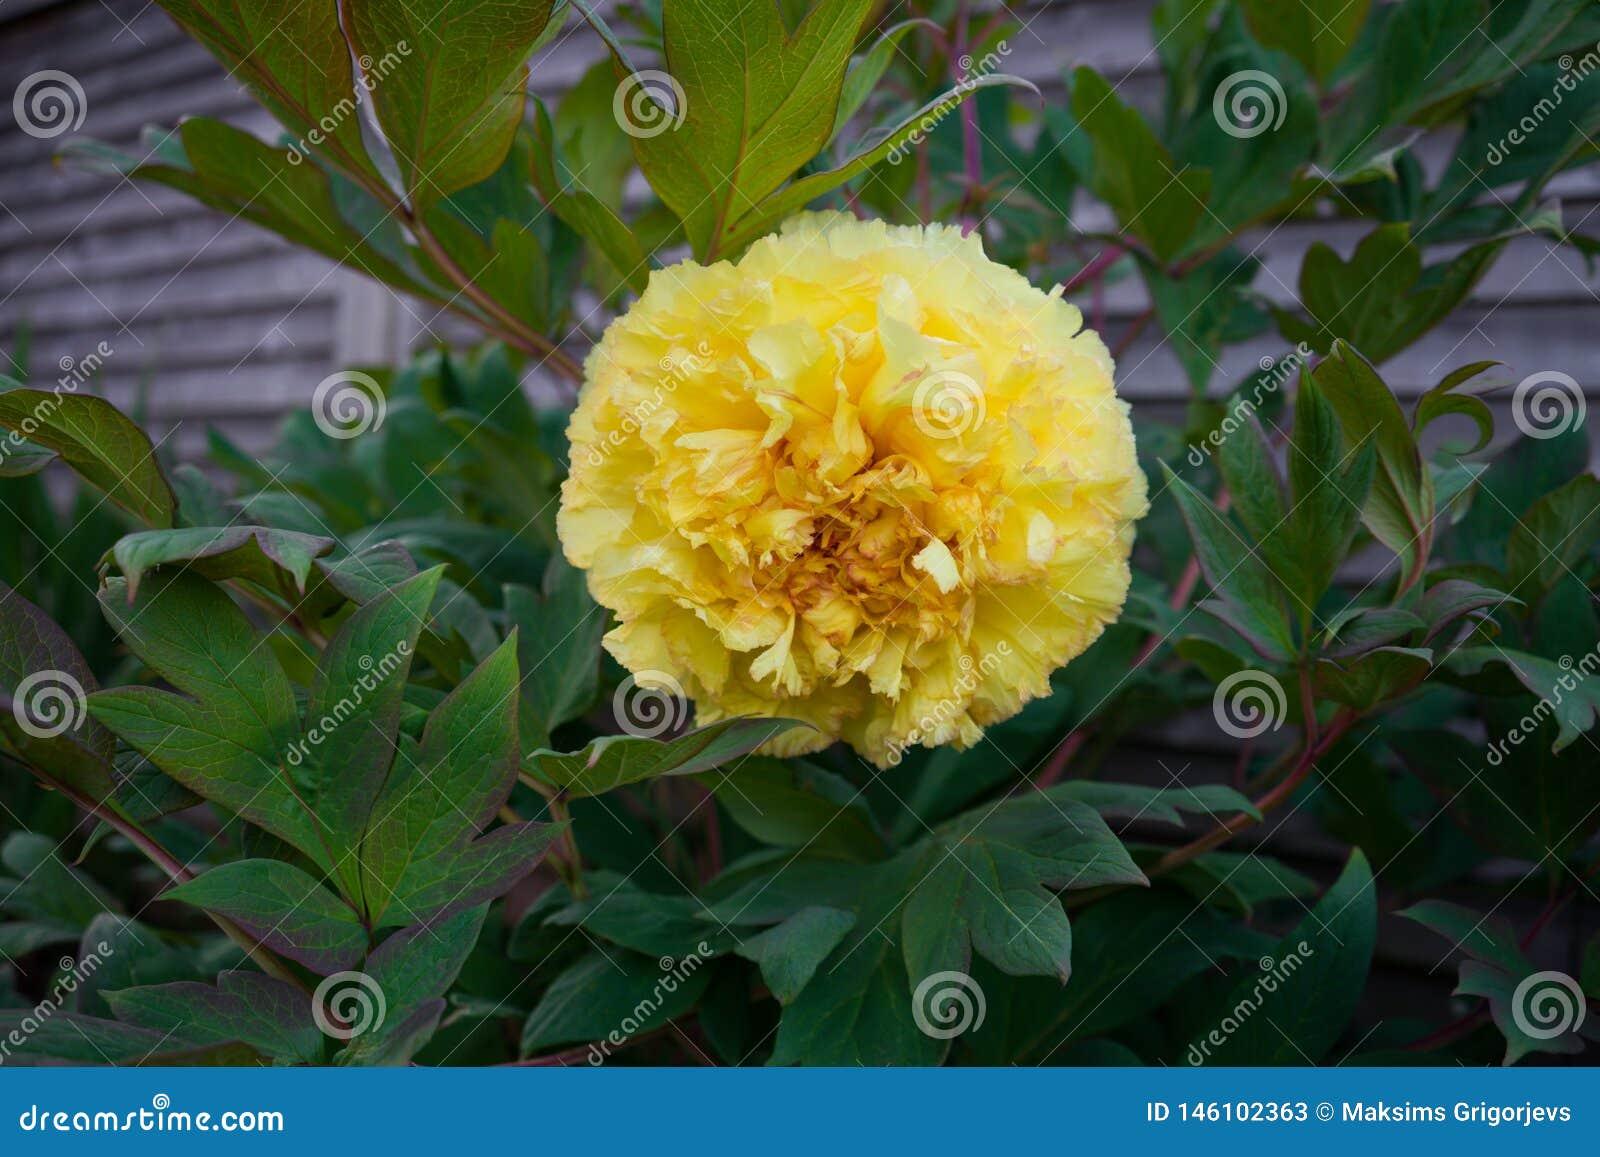 Itoh Hybrid Peony Yellow Bartzella in garden